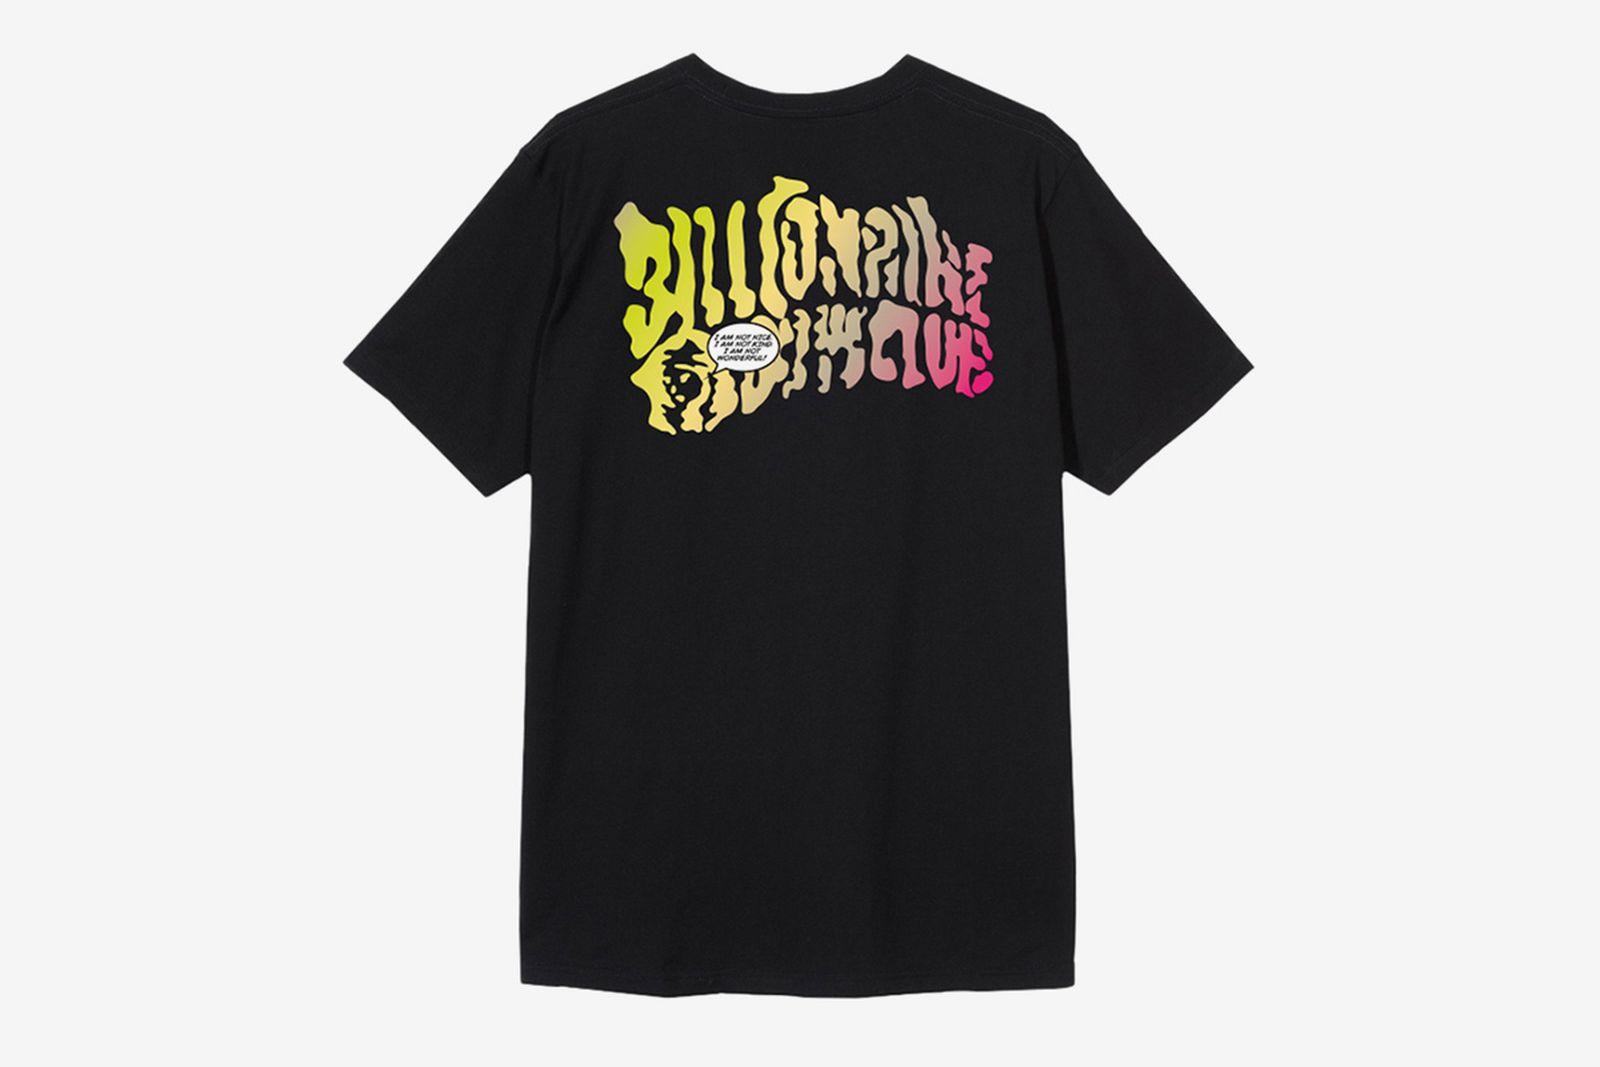 Billionaire Boys Club x Mattel's Spooky 'Master of the Universe' T-shirt black